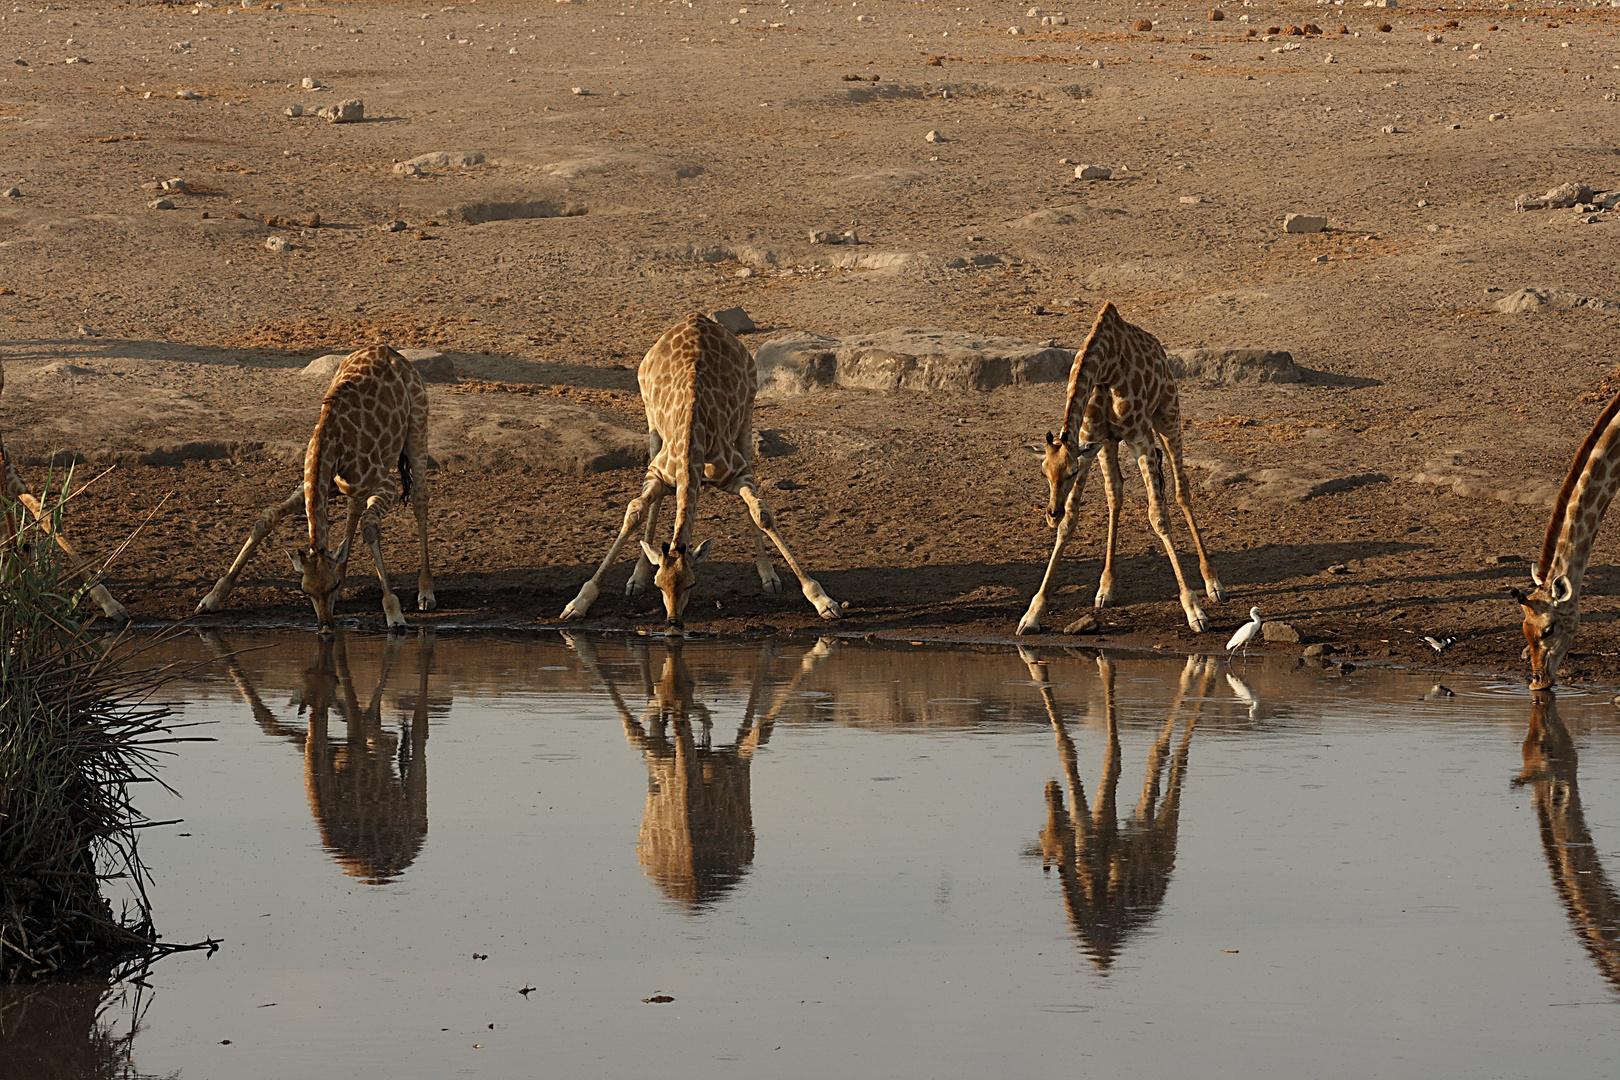 giraffes at the bar